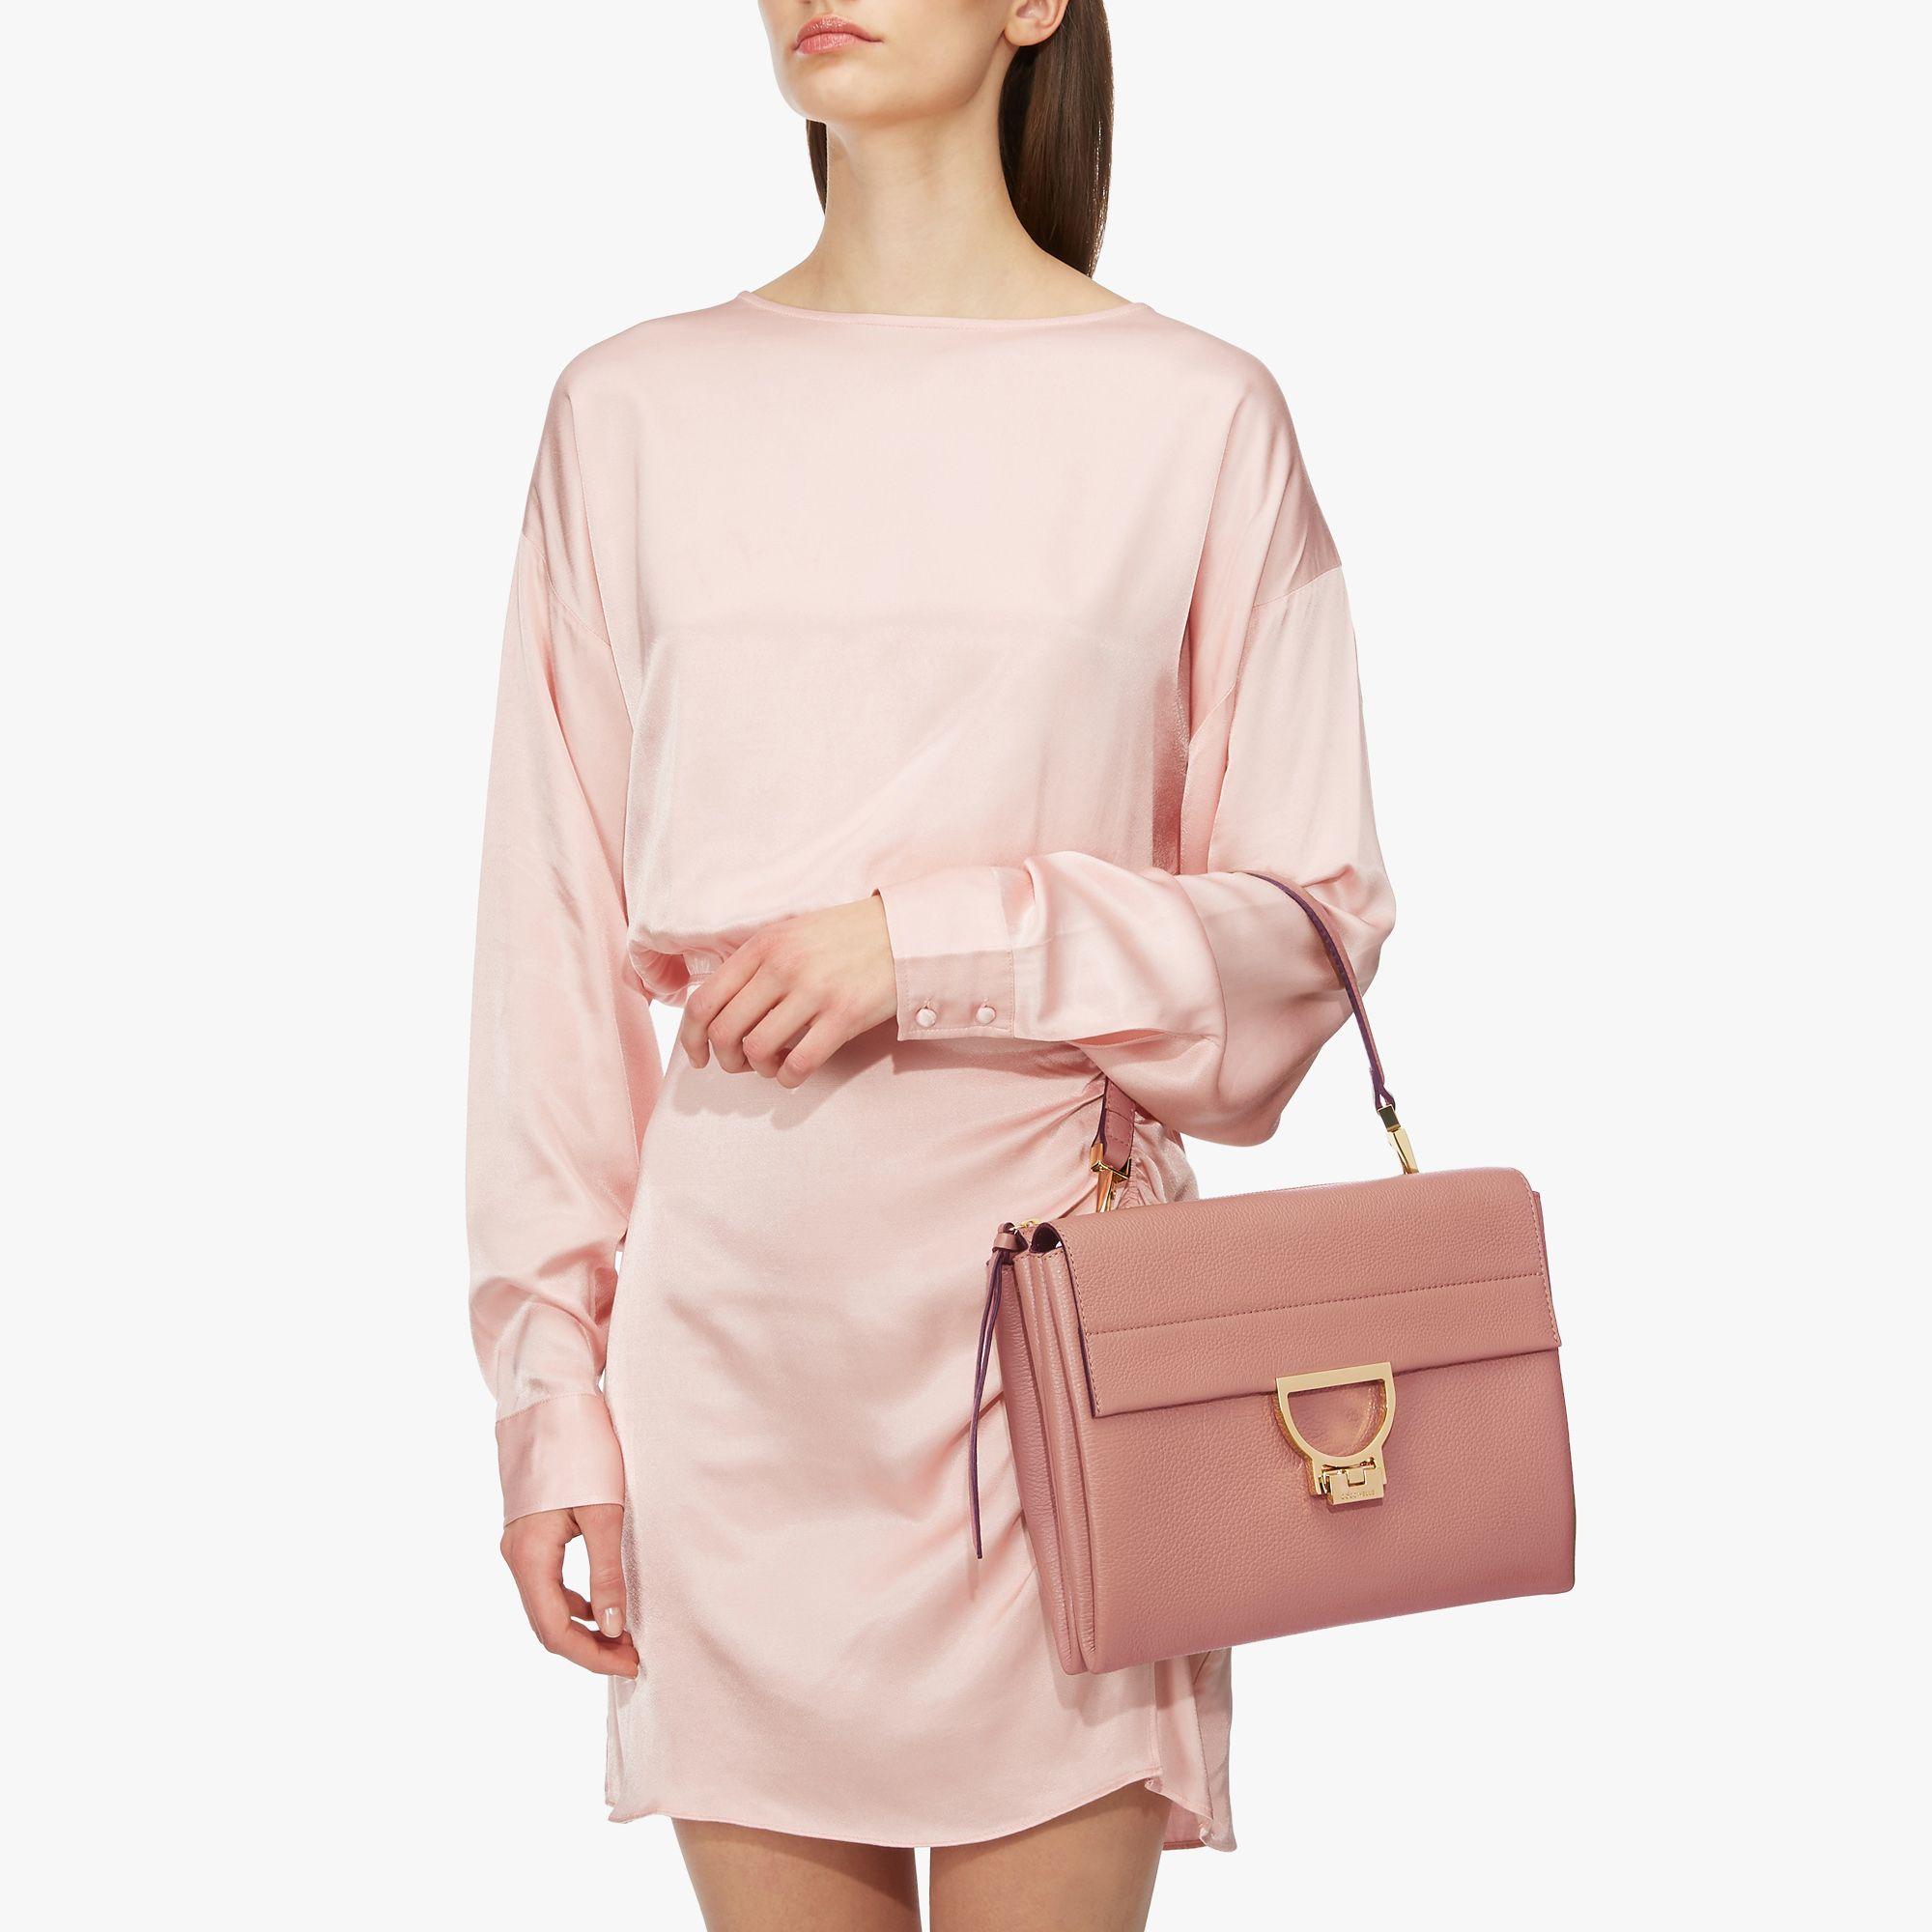 4837b432ed5e Arlettis Maxi in 2019 | 2019 | Bags, Shoulder bag, Leather interior